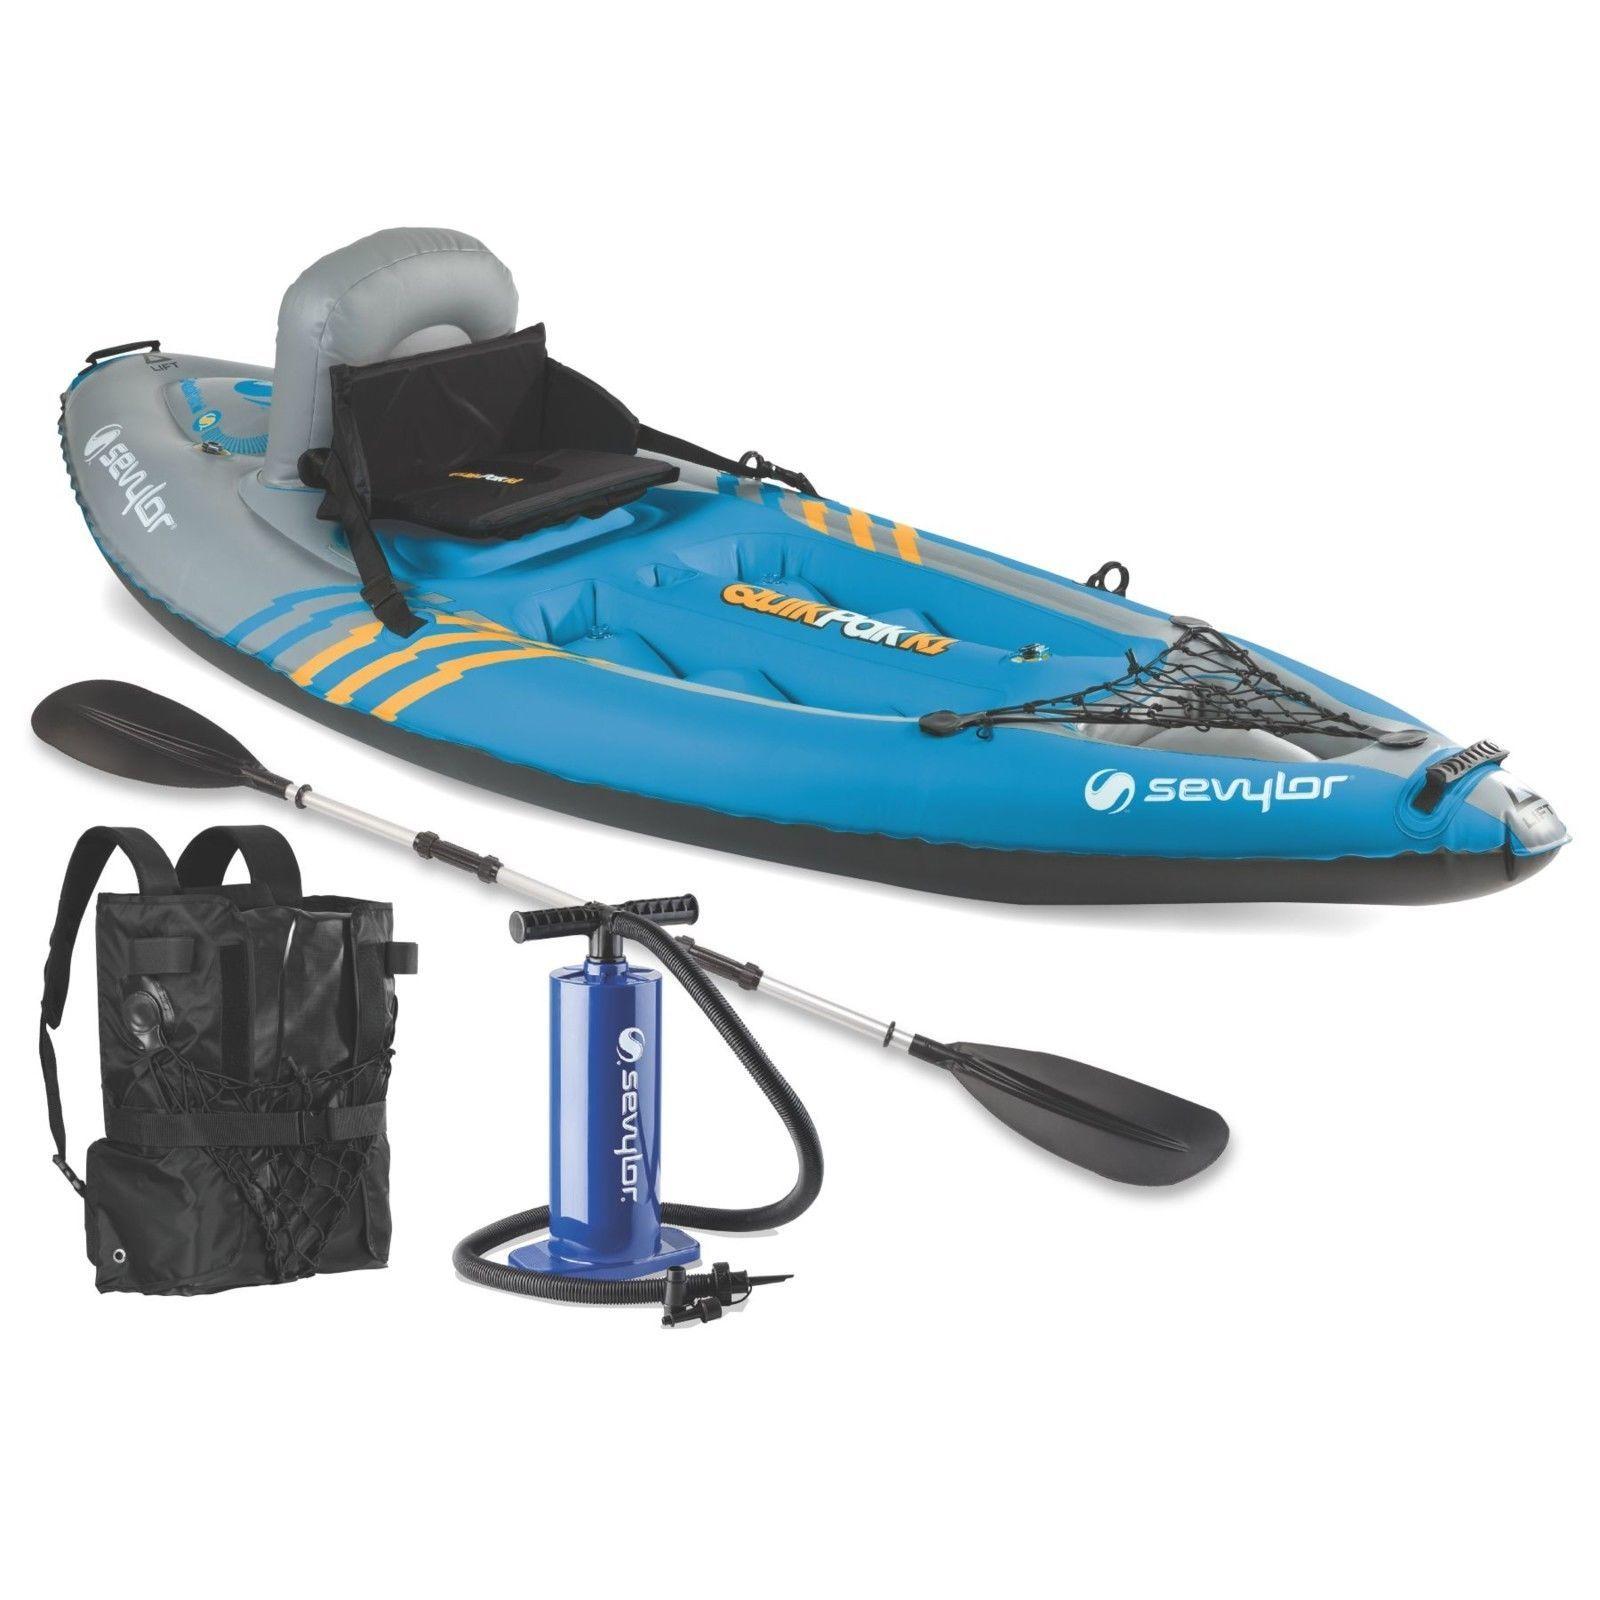 Awe Inspiring 1 Person Kayak 8X7X3 Paddle Hand Pump Included Easy Setup Beutiful Home Inspiration Xortanetmahrainfo